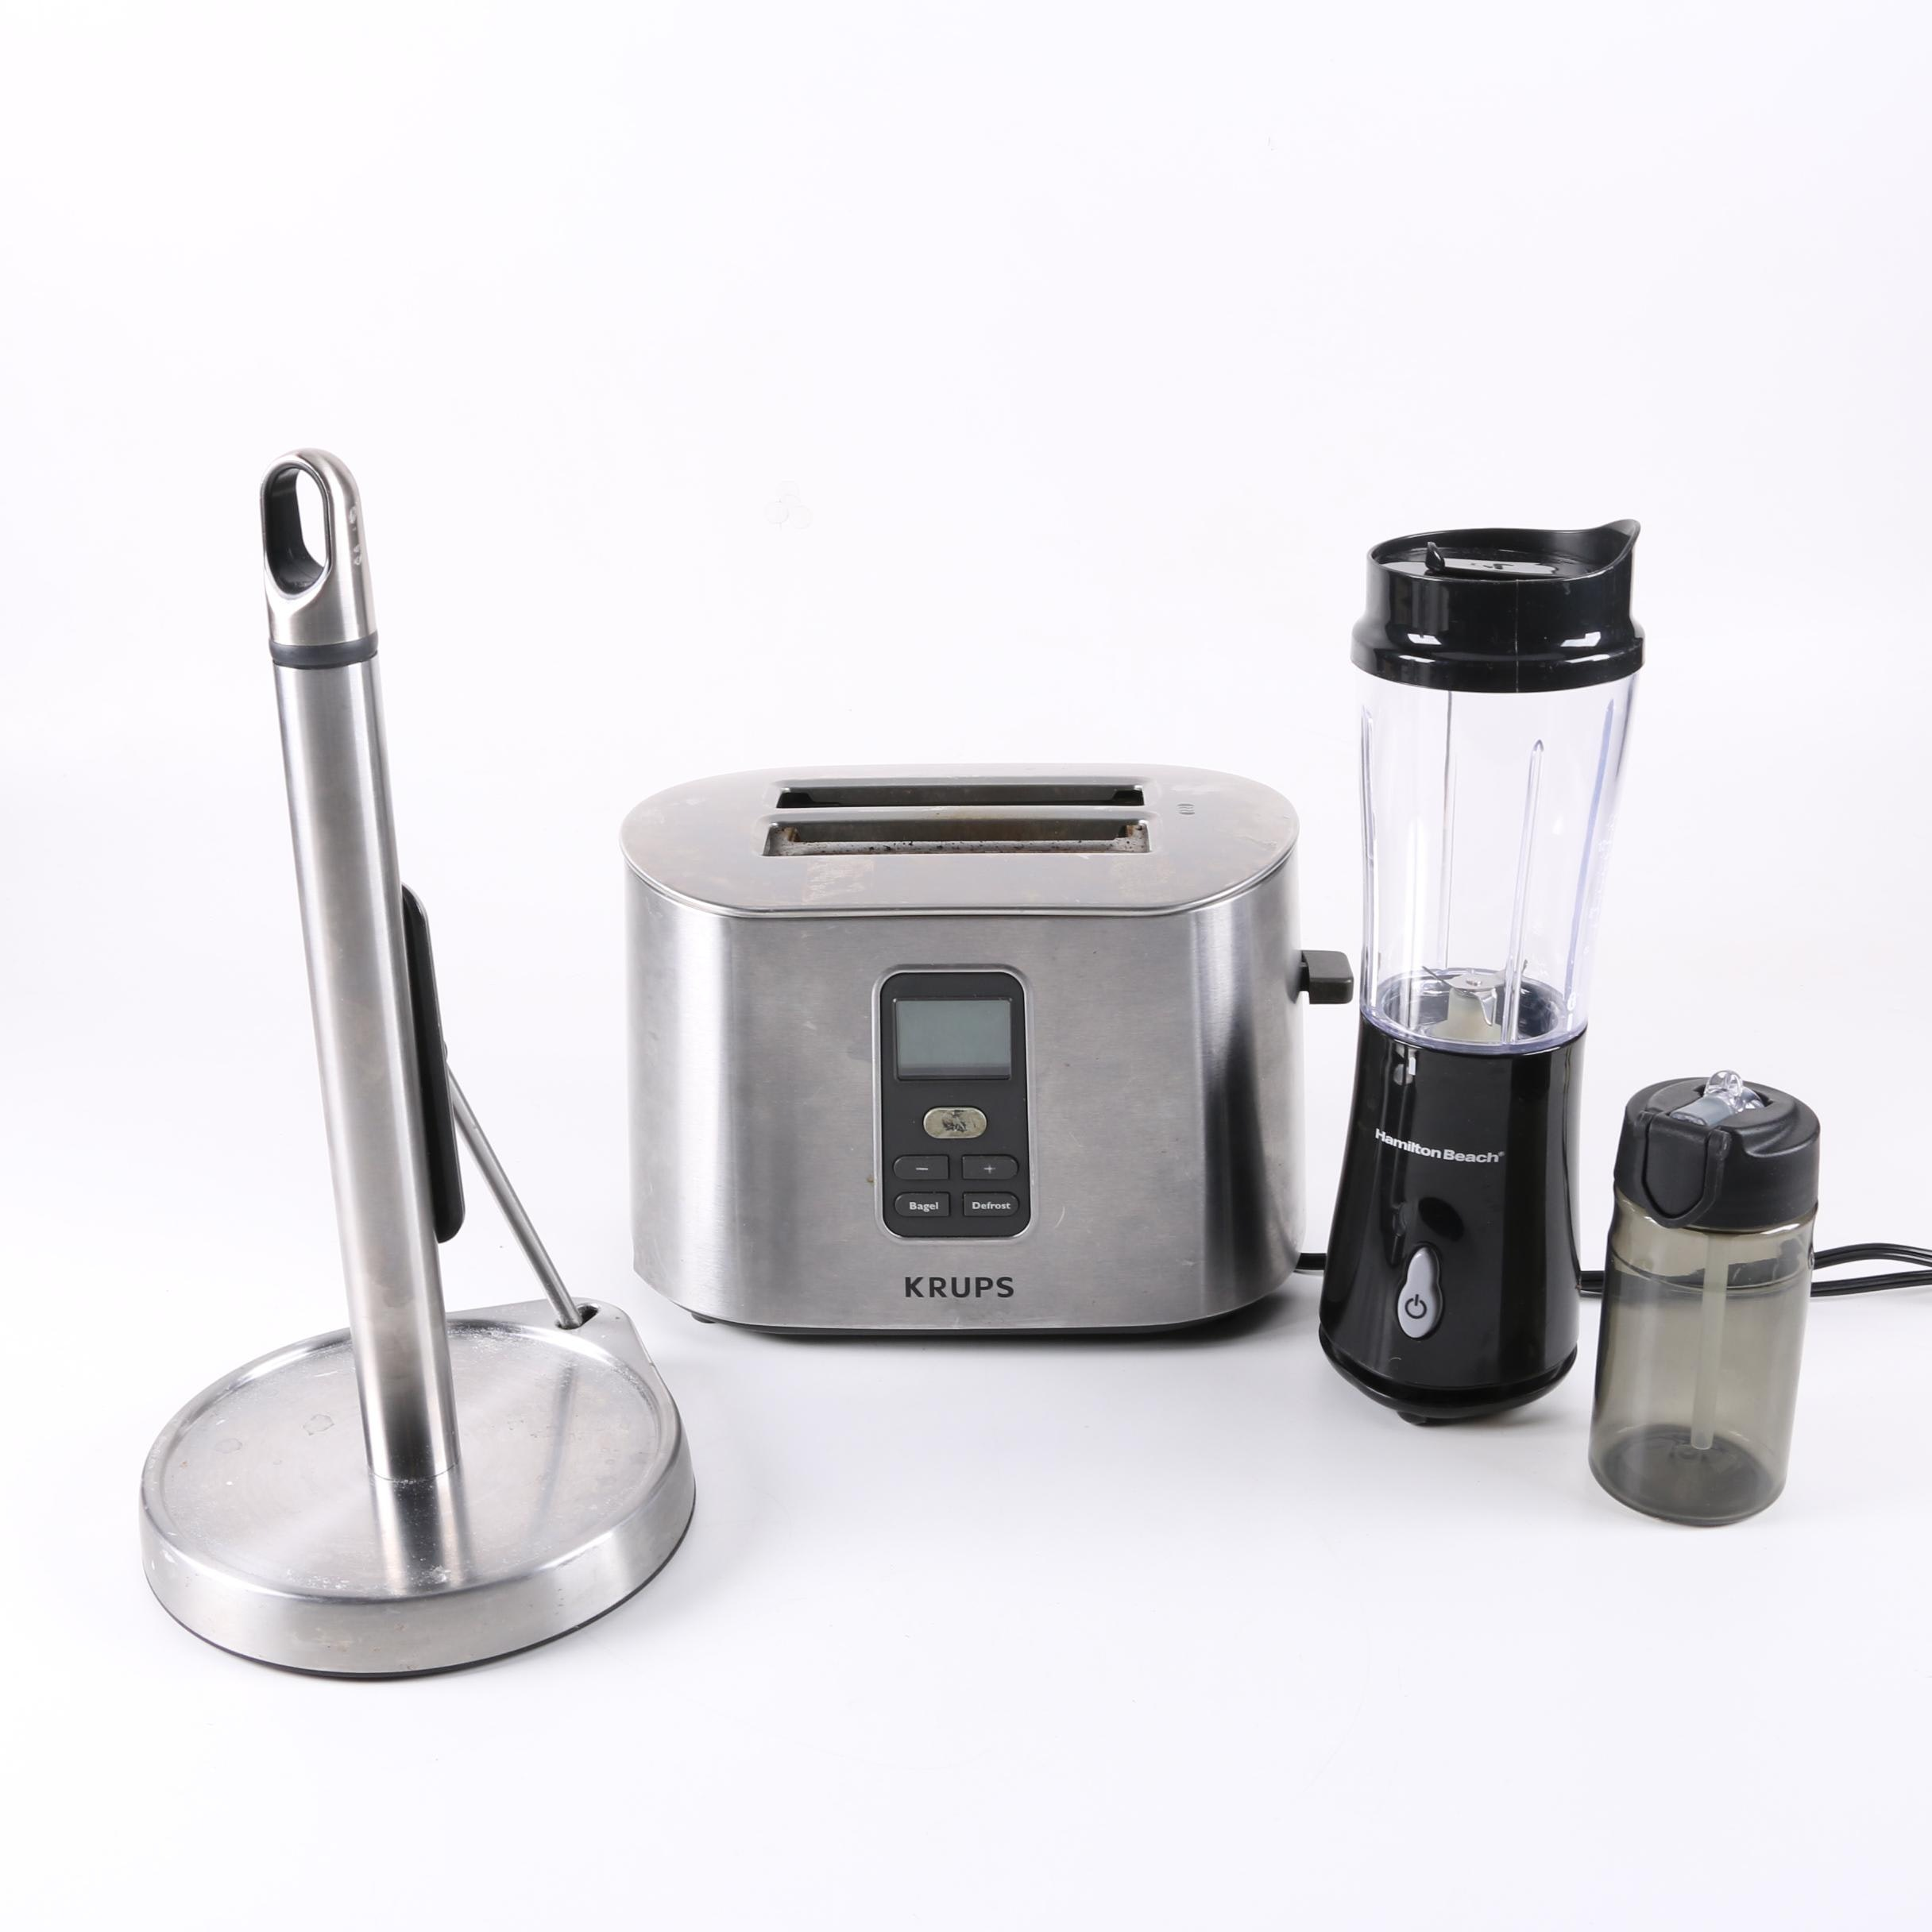 Krups Bagel Toaster, Hamilton Beach Blender and Paper Towel Holder